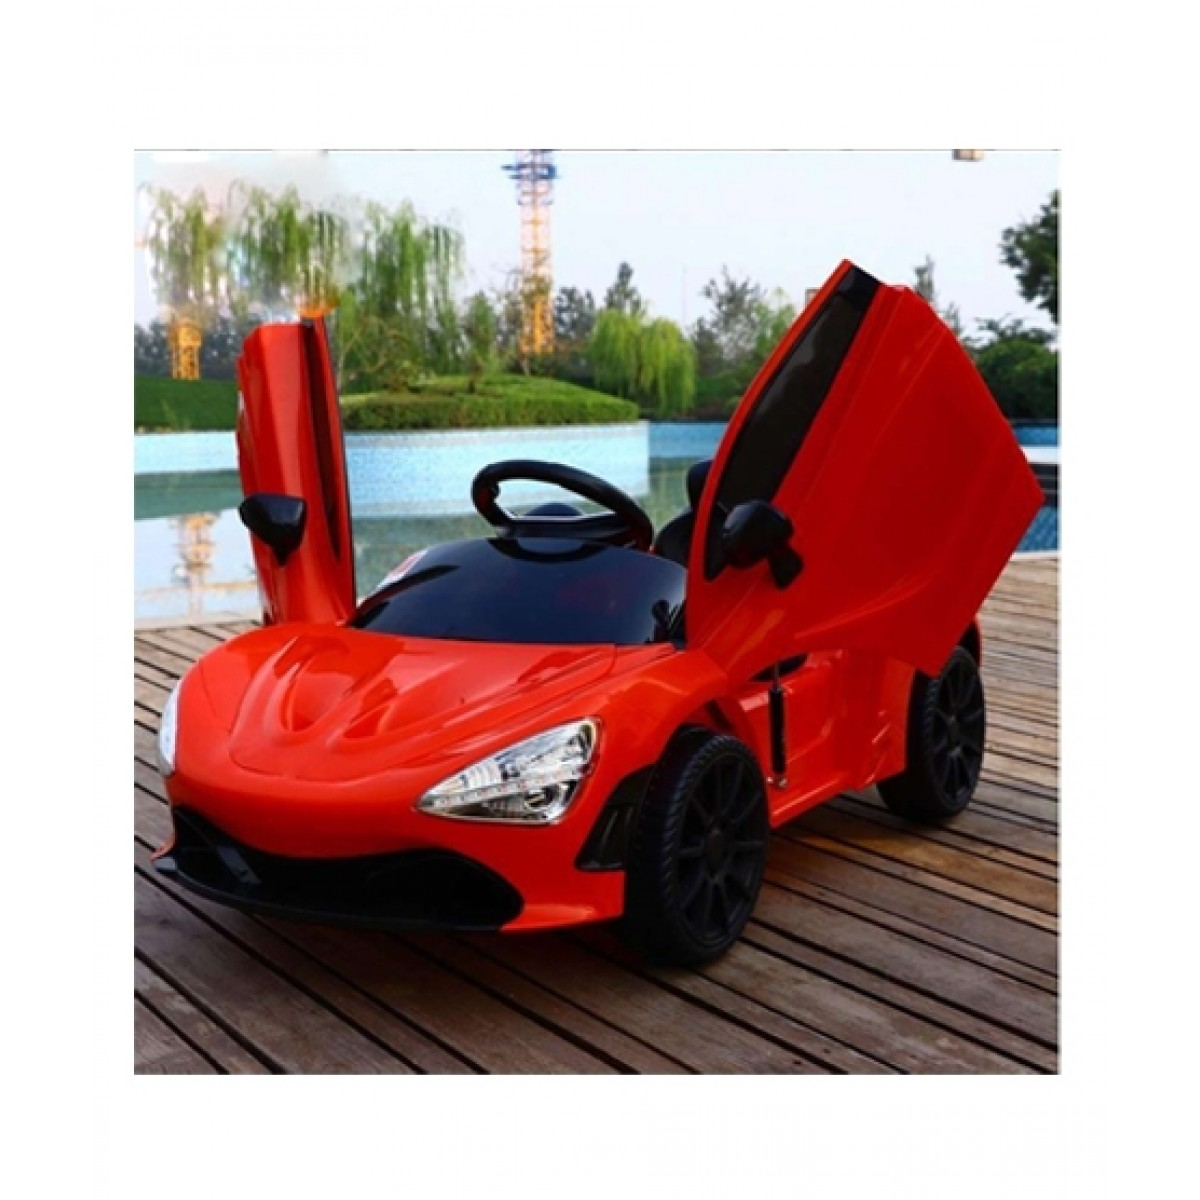 Btl Toys Ride On Sports Car Price In Pakistan Buy Btl Toys Electric Ride On Sports Car For Kids Red 7200s Ishopping Pk